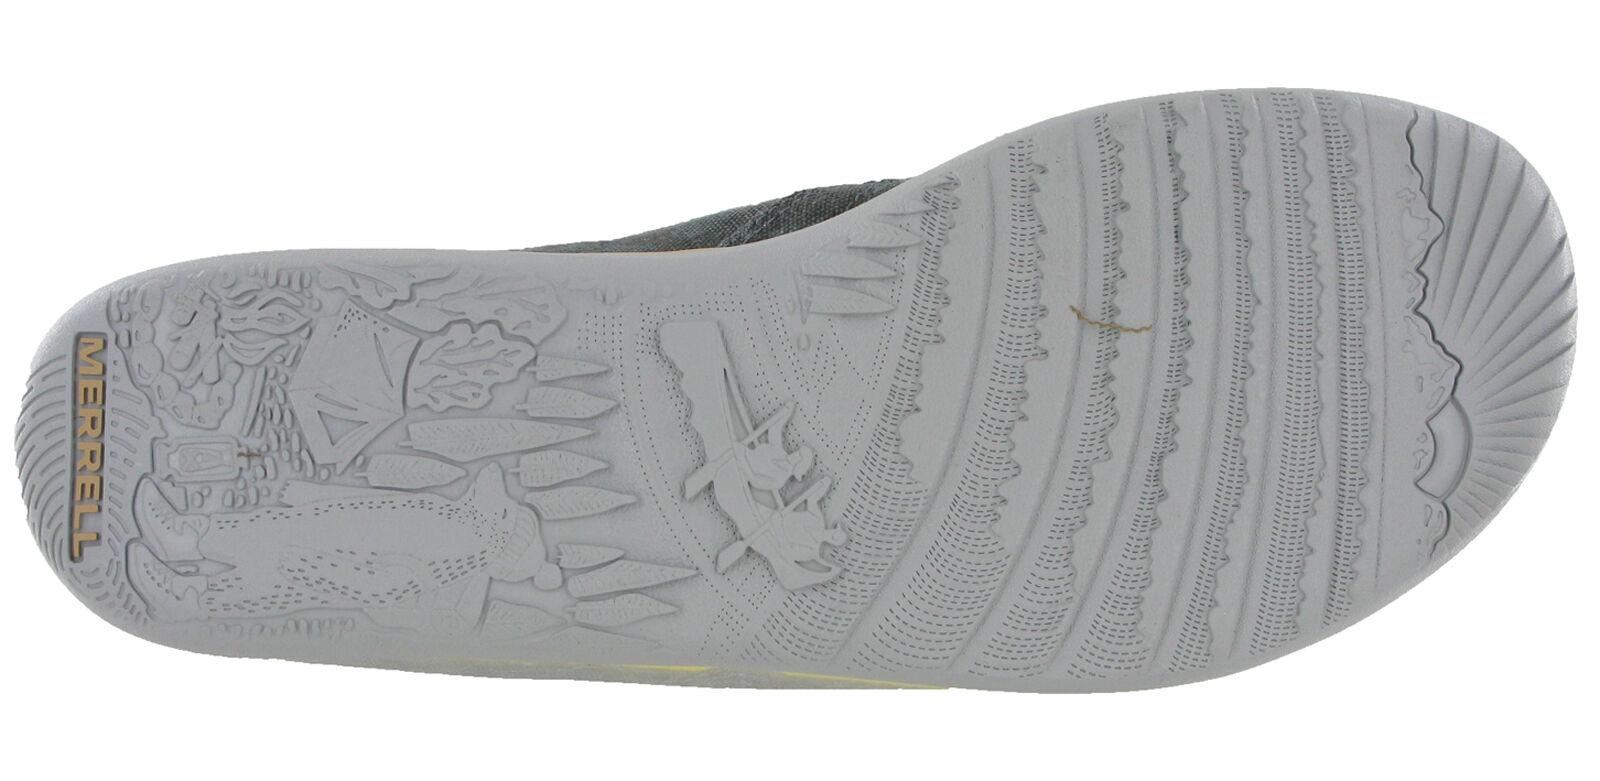 Merrell Duskair Moc Print Turbulence Canvas Lightweight Flat J91377 Schuhes  Uomo J91377 Flat 0e95f8